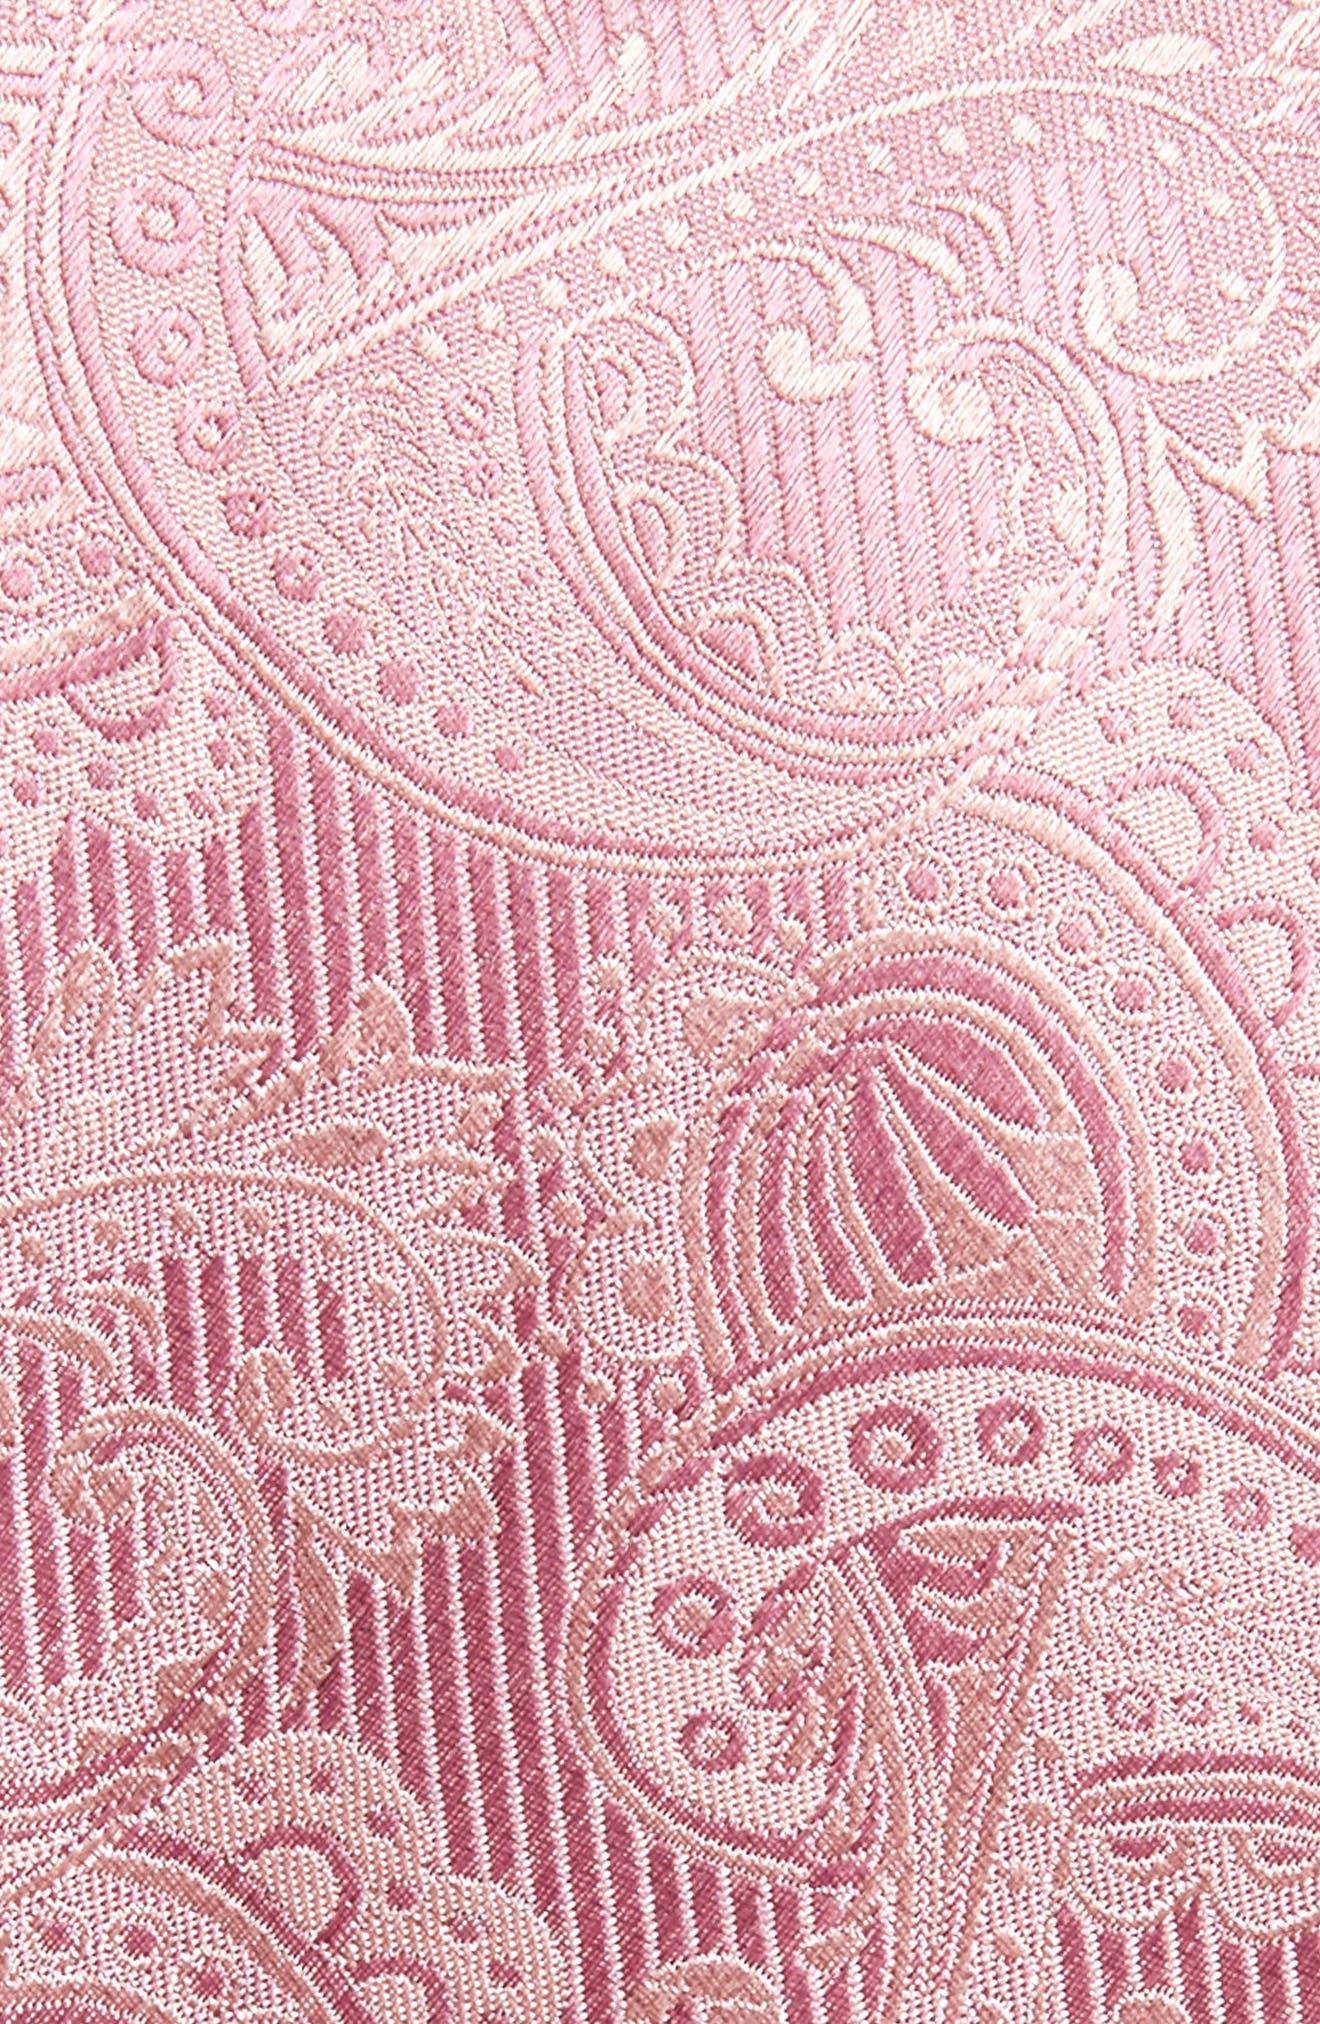 Paisley Silk Tie,                             Alternate thumbnail 2, color,                             Dusty Rose